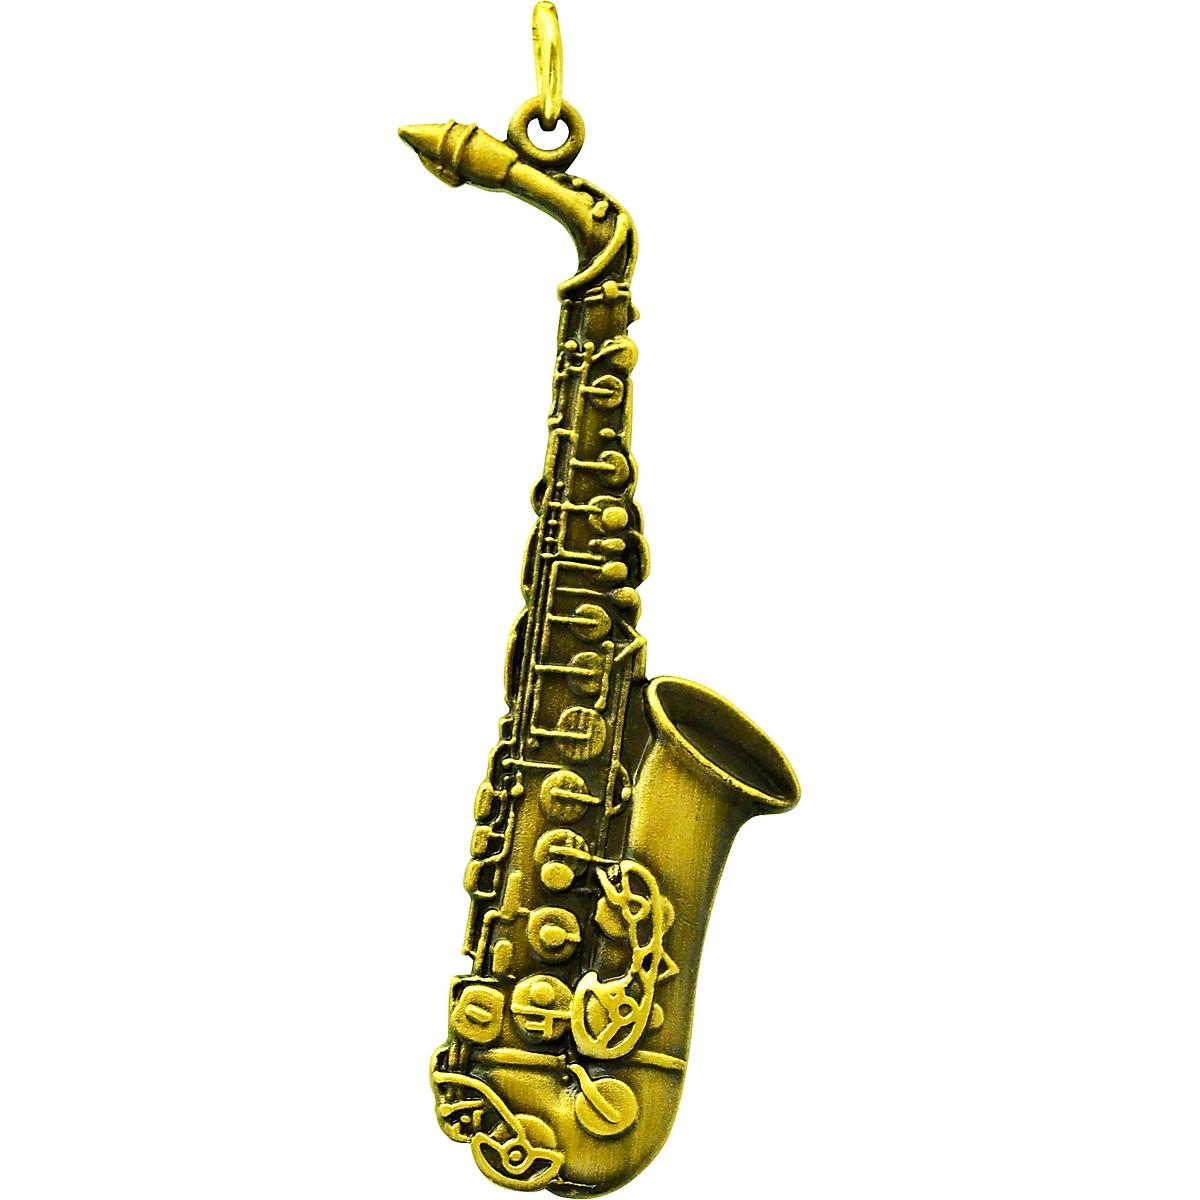 AIM Alto Saxophone Keychain